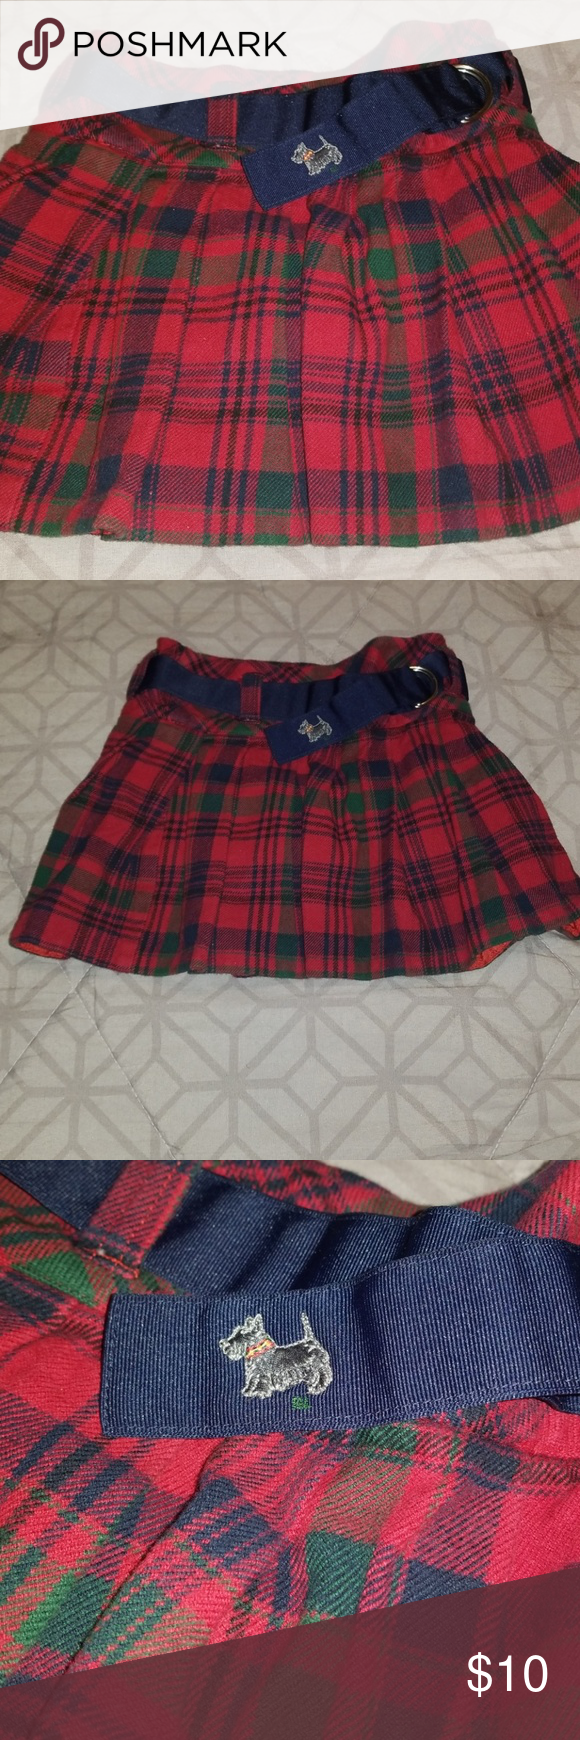 49384d3db Blue And Green Plaid Pleated Skirt | Saddha